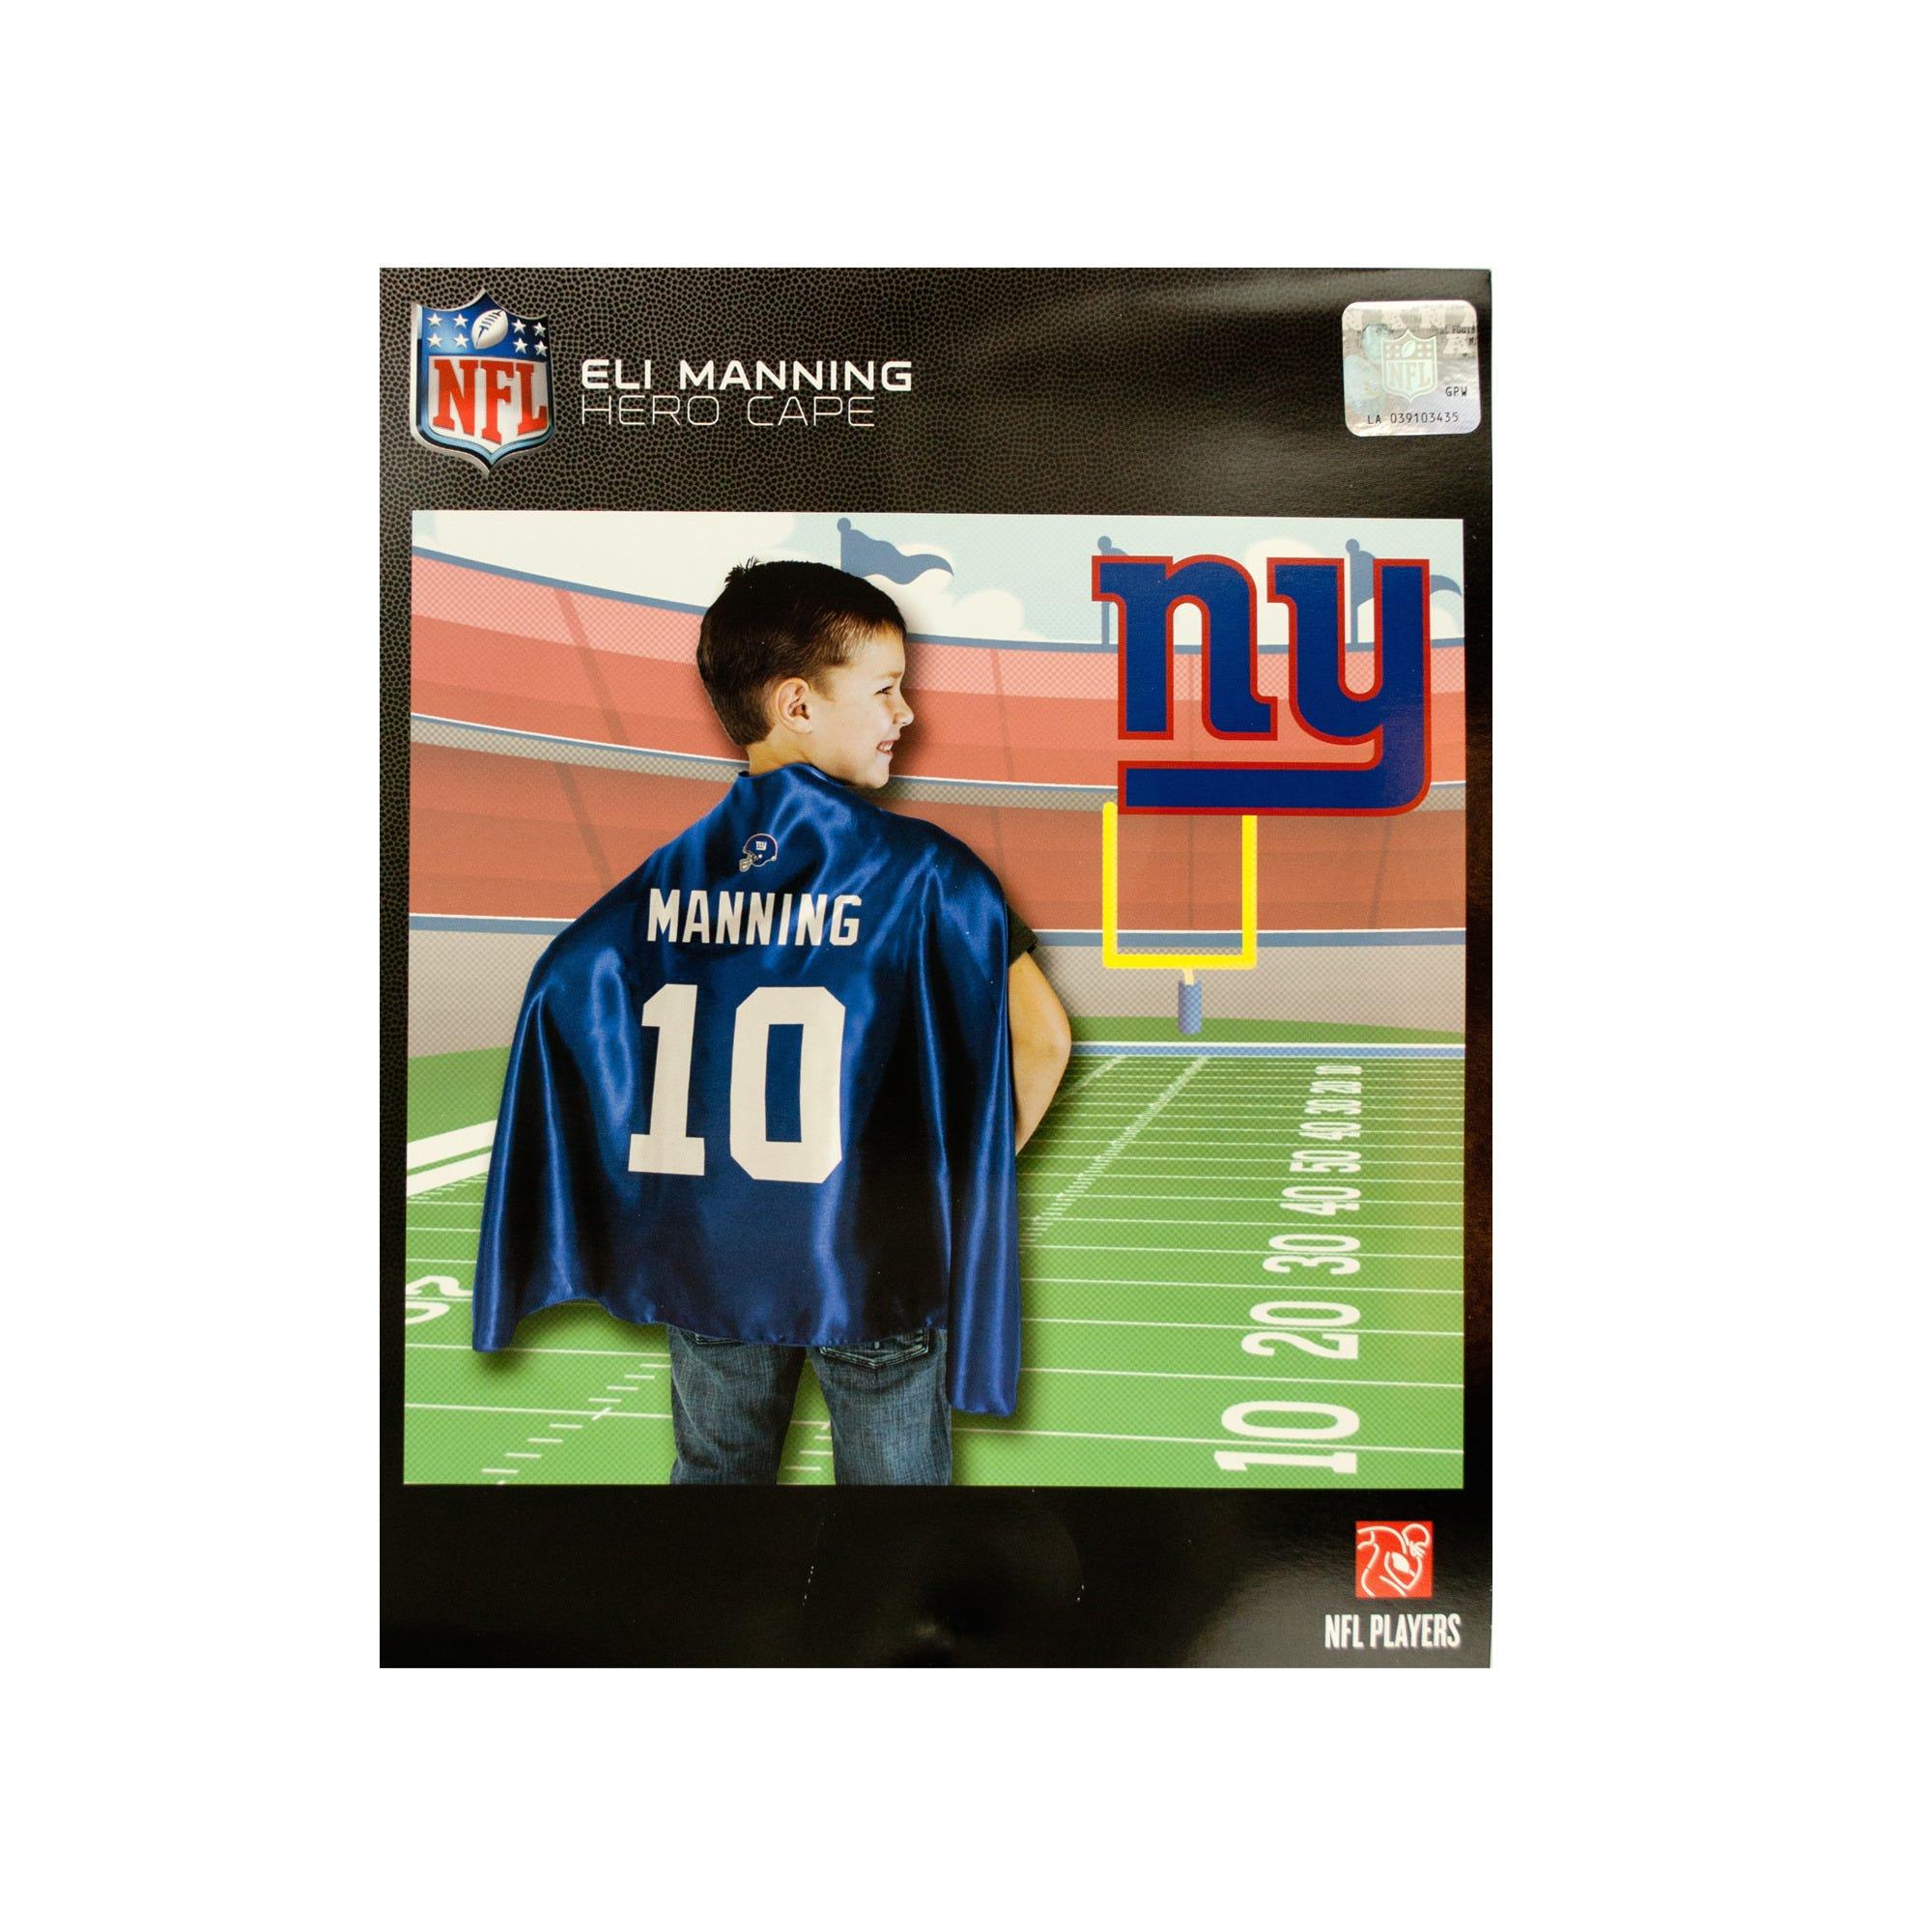 NEW York Giants Eli Manning Hero Cape- Qty 18